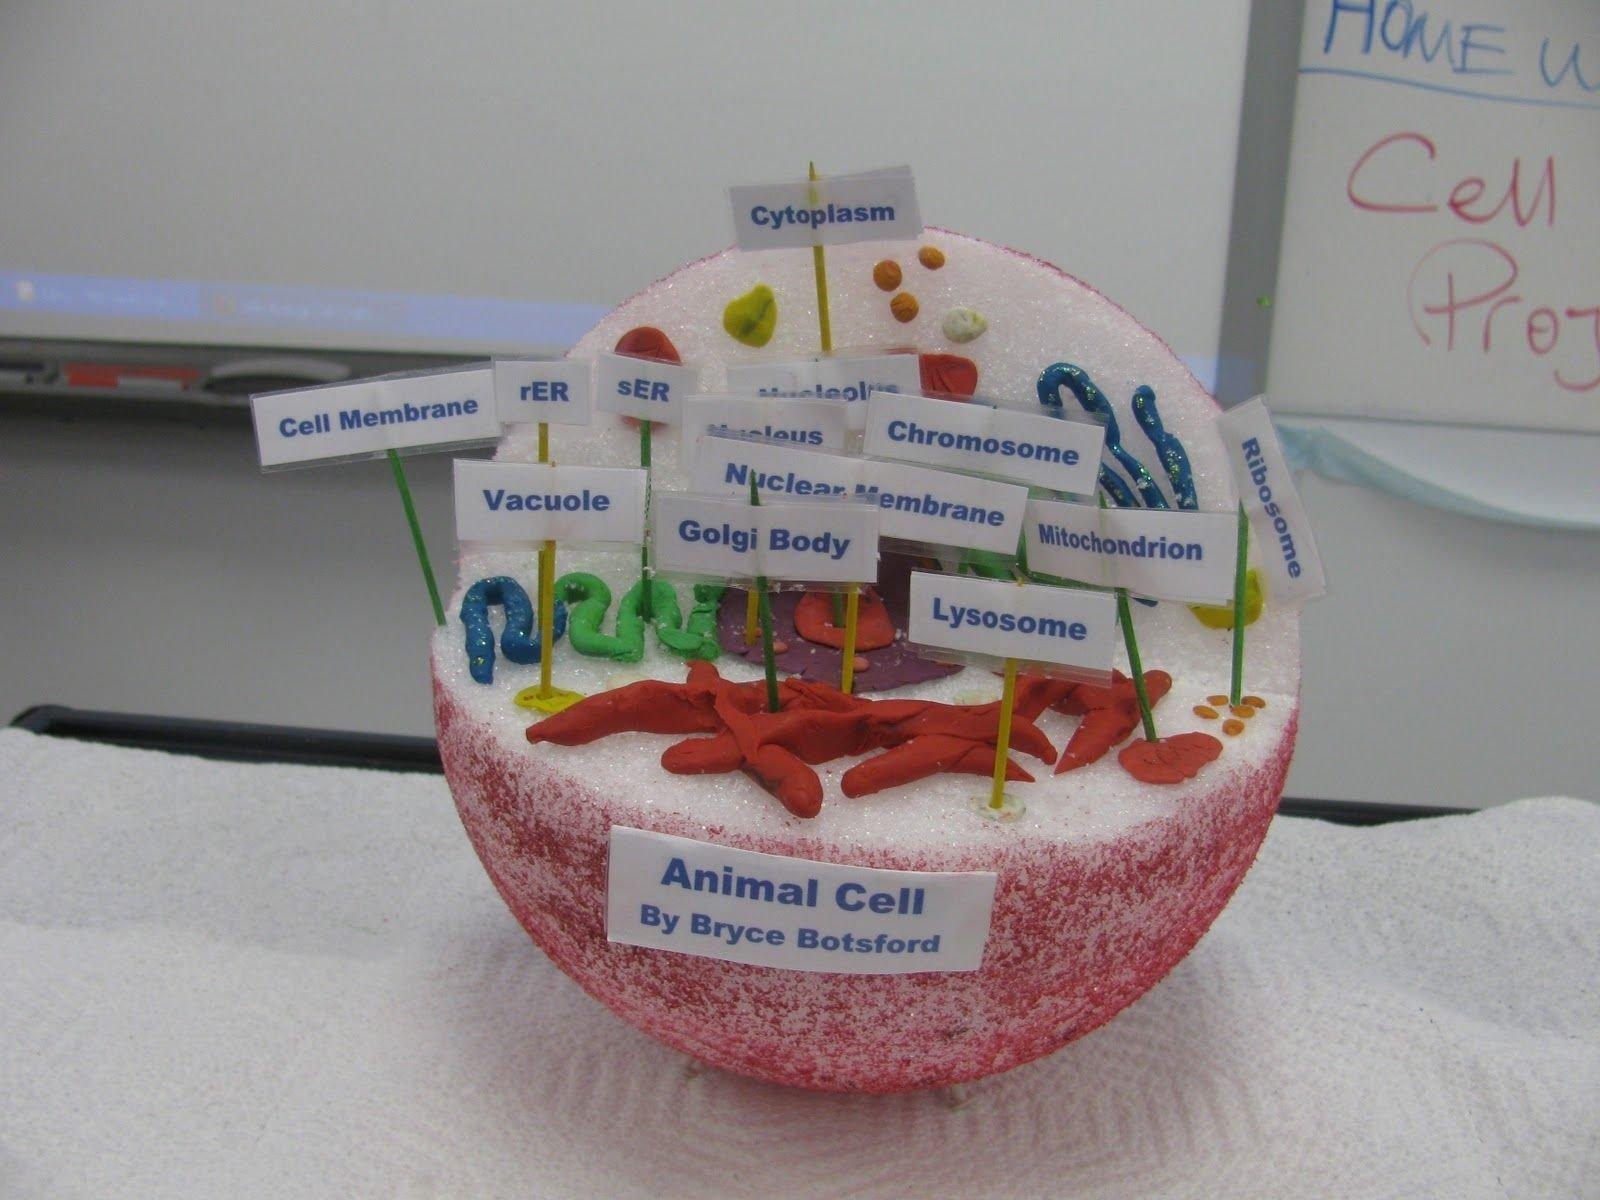 10 Famous 3D Cell Model Project Ideas 3d cell model project ideas cells project projects email this 1 2020